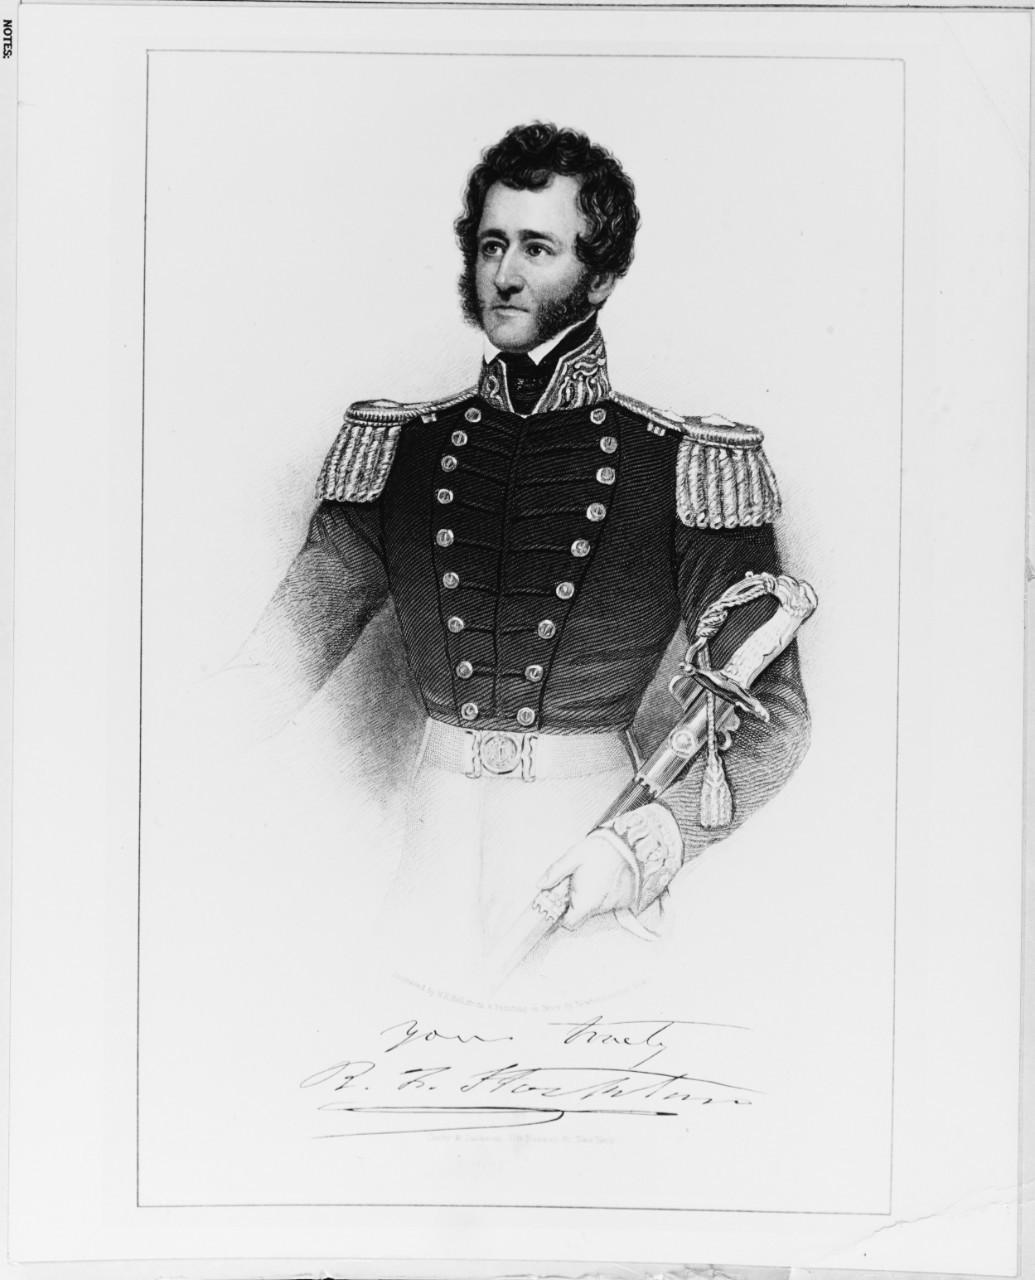 Robert F. Stockton